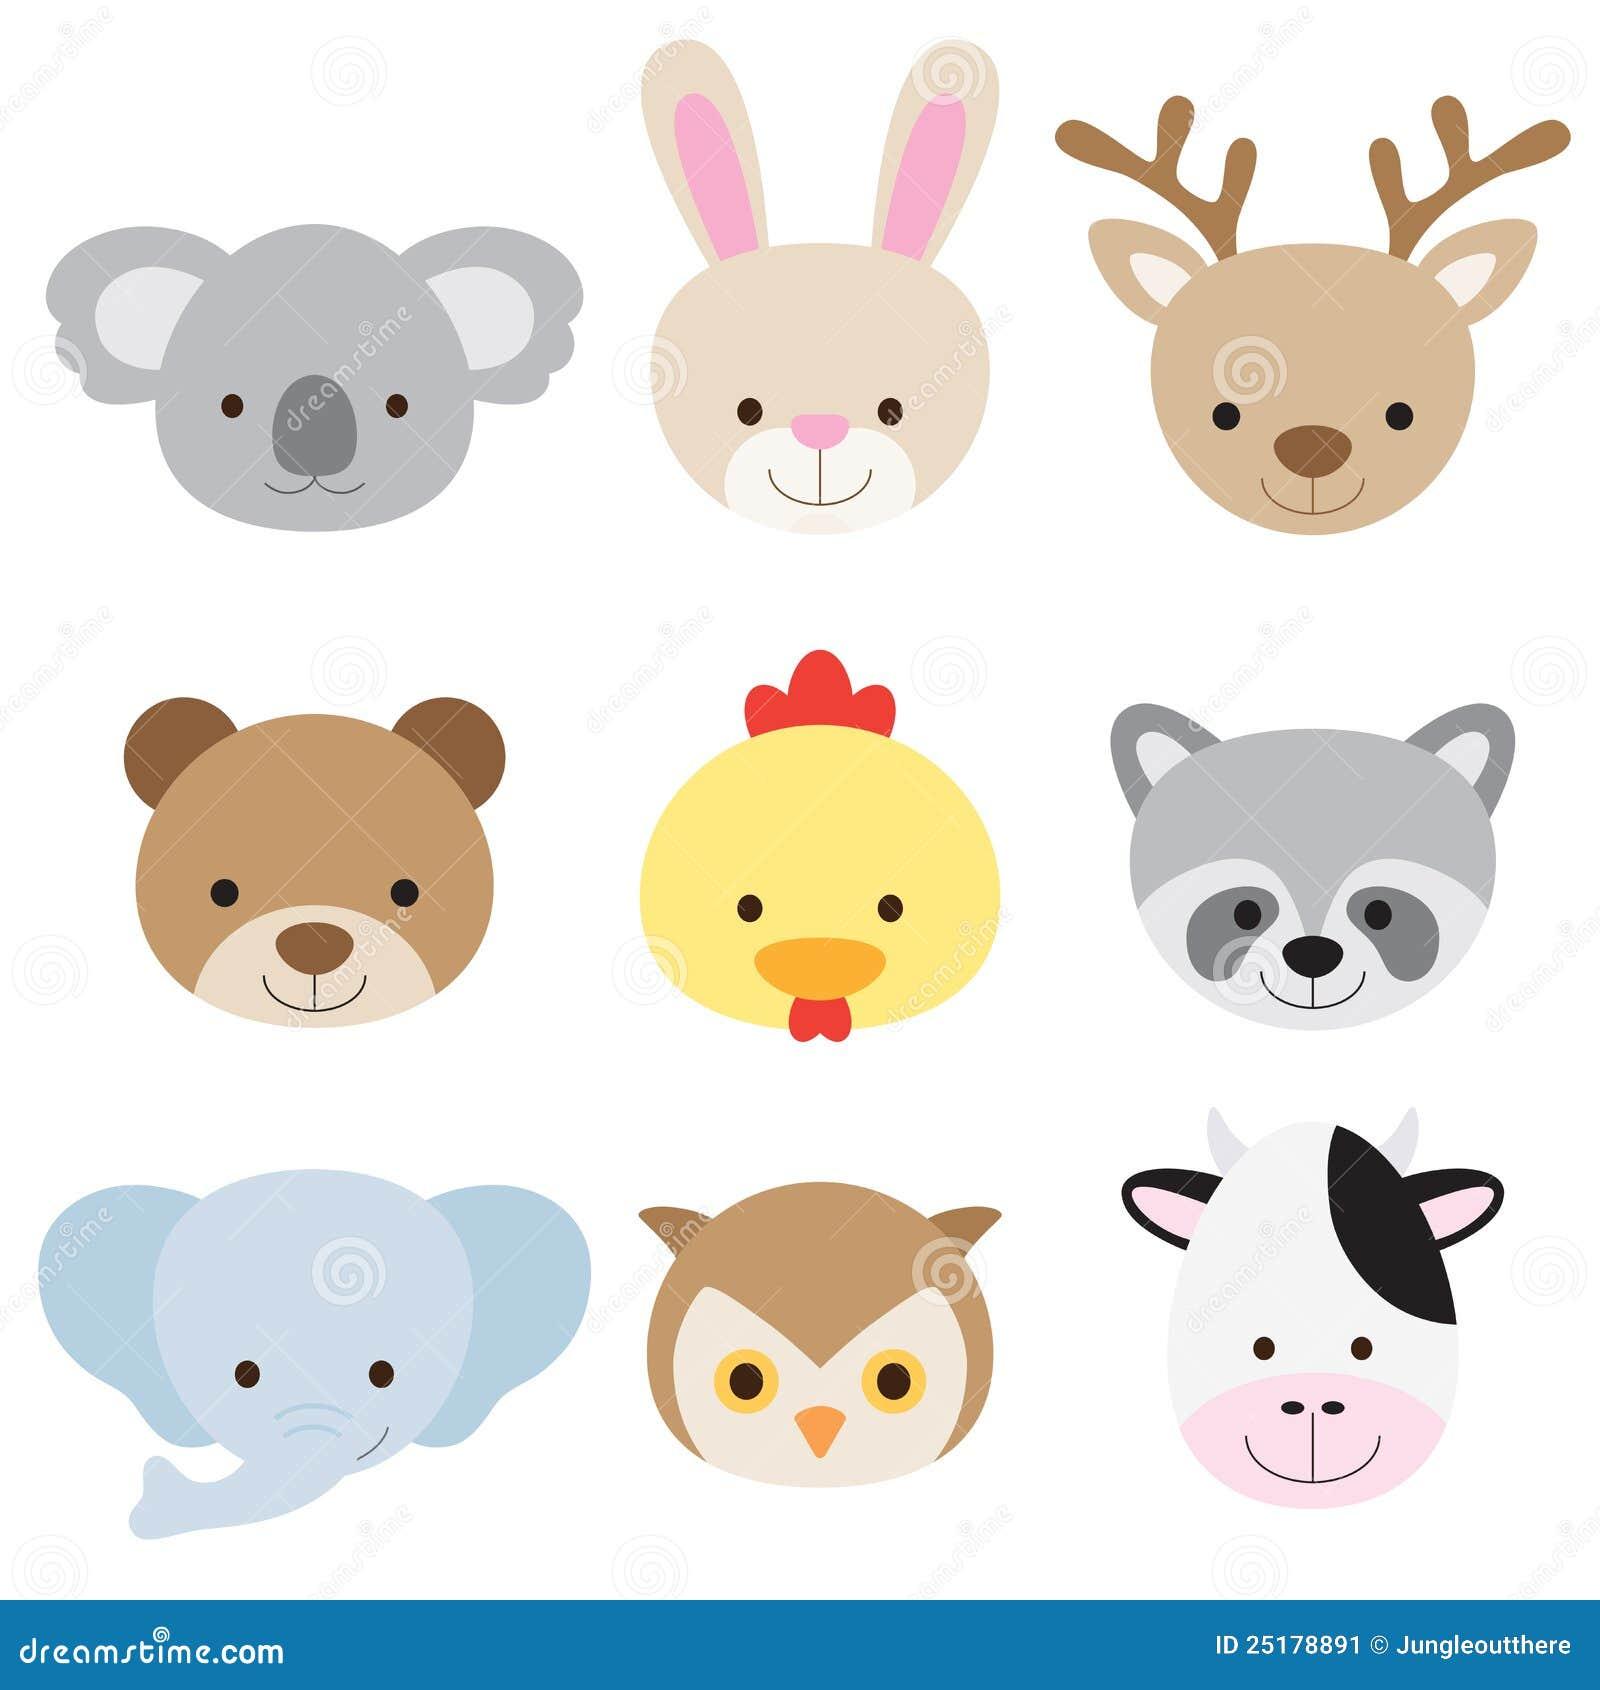 Animal Face Set Stock Image - Image: 25178891 Raccoon Face Clip Art